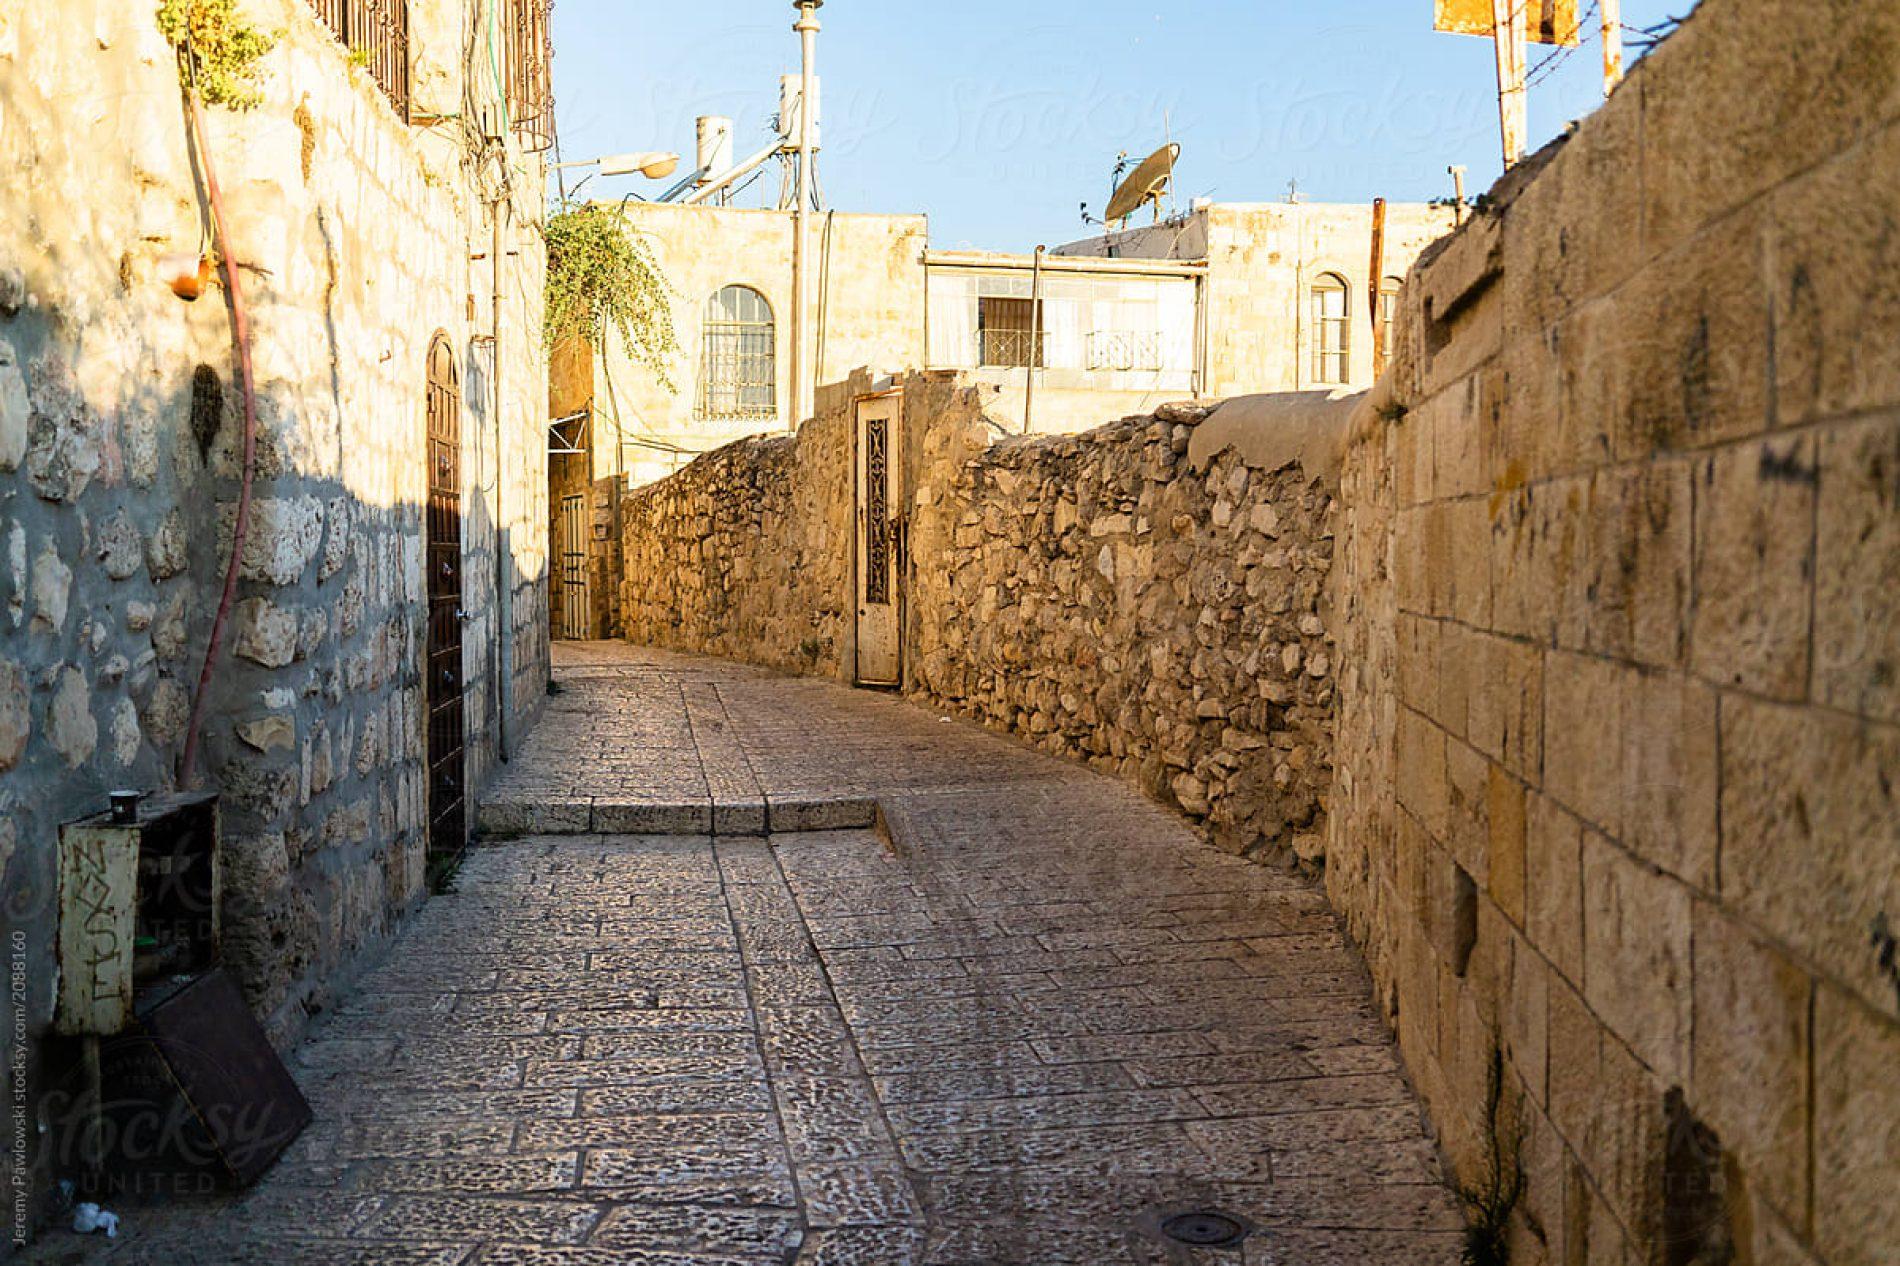 Josué 20 – As Cidades de Refúgio